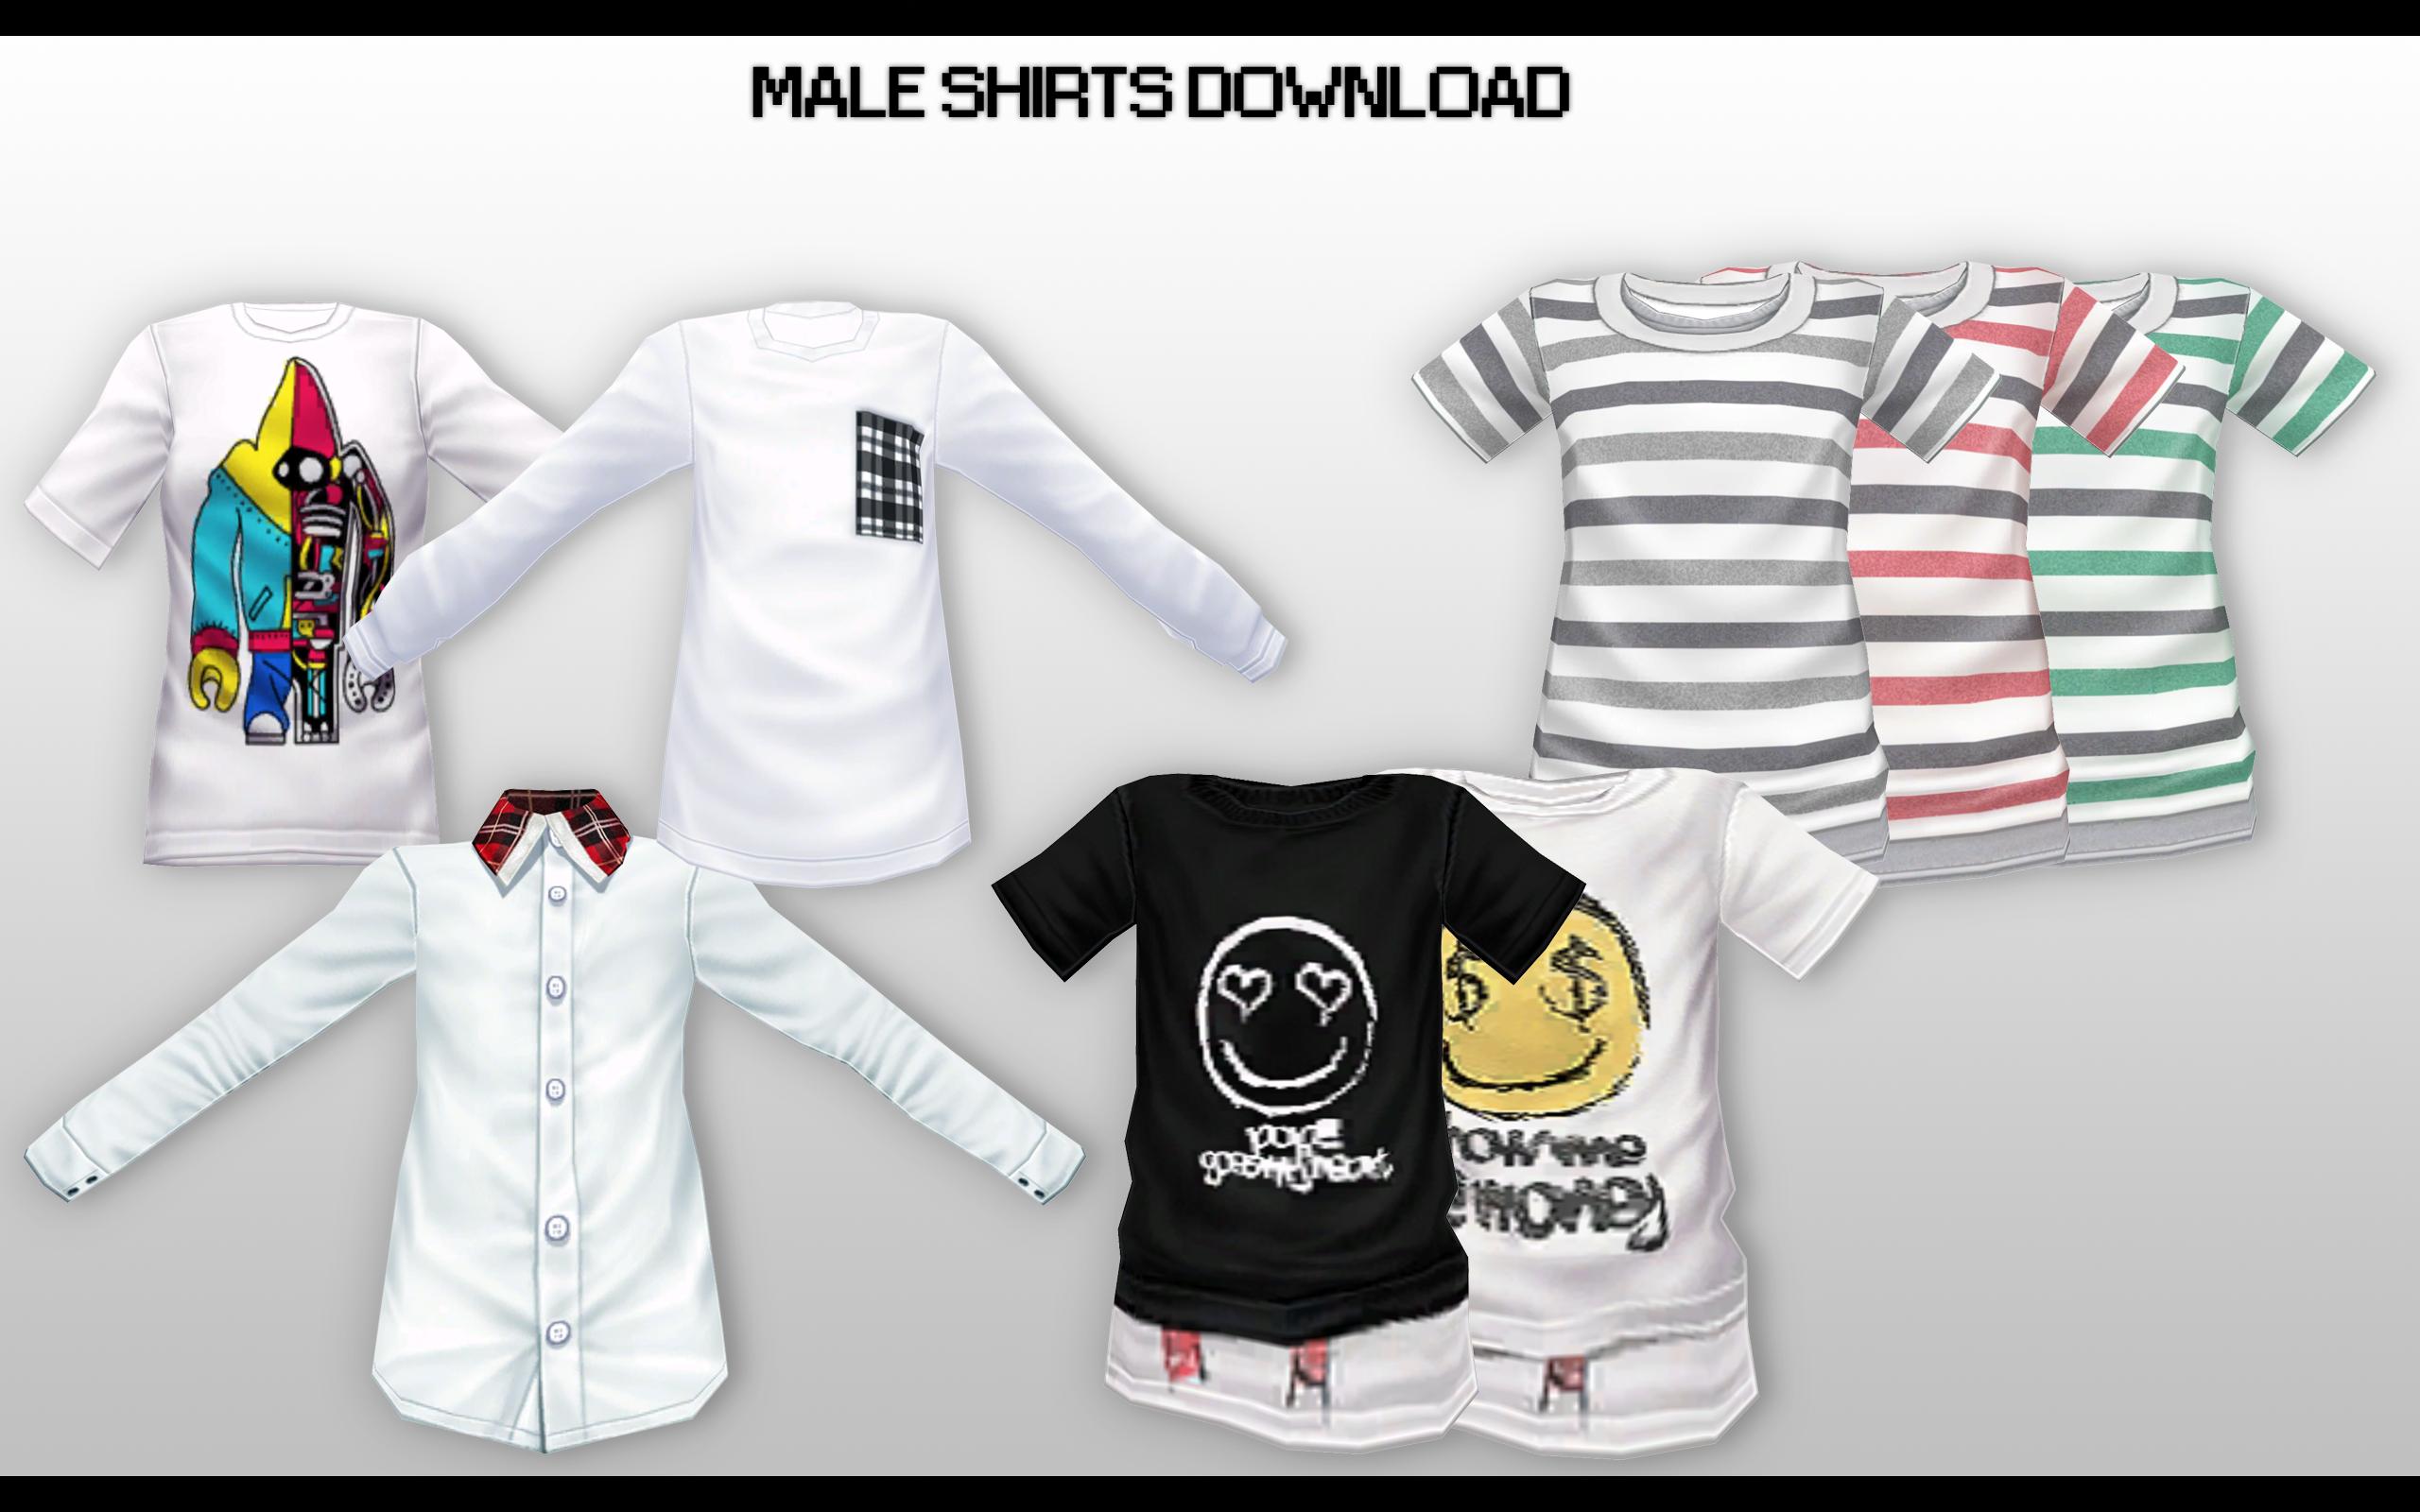 66399fd25e23 Sims 4 Male Band Shirts